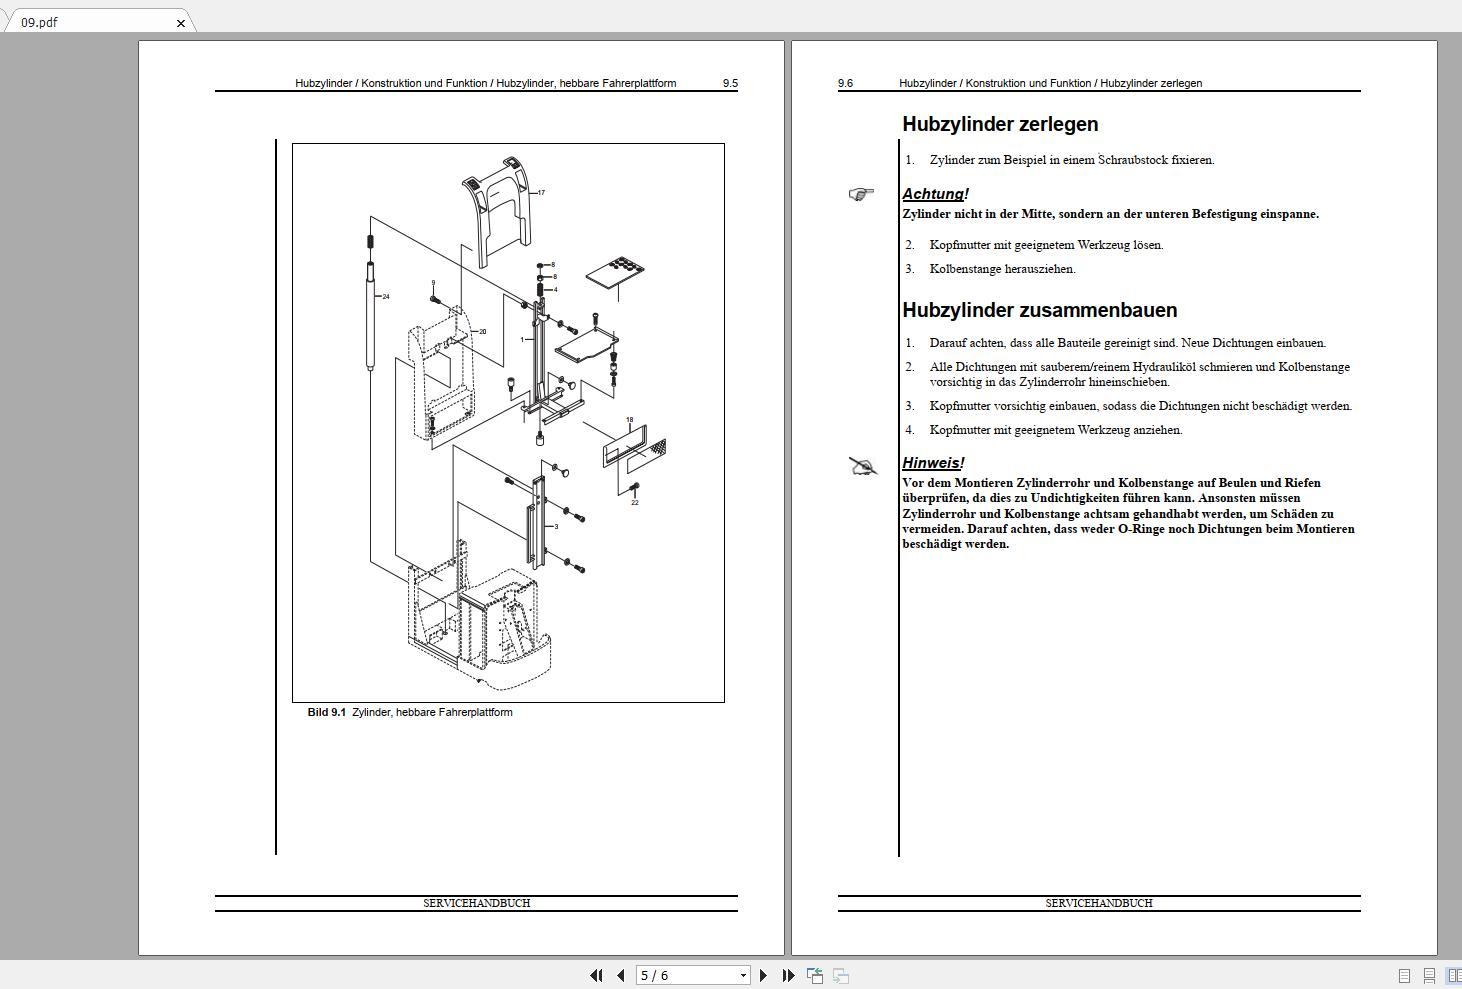 Nissan_Forklift_Warehouse_PP_Series_119036-119037_Service_ManualENDE_5